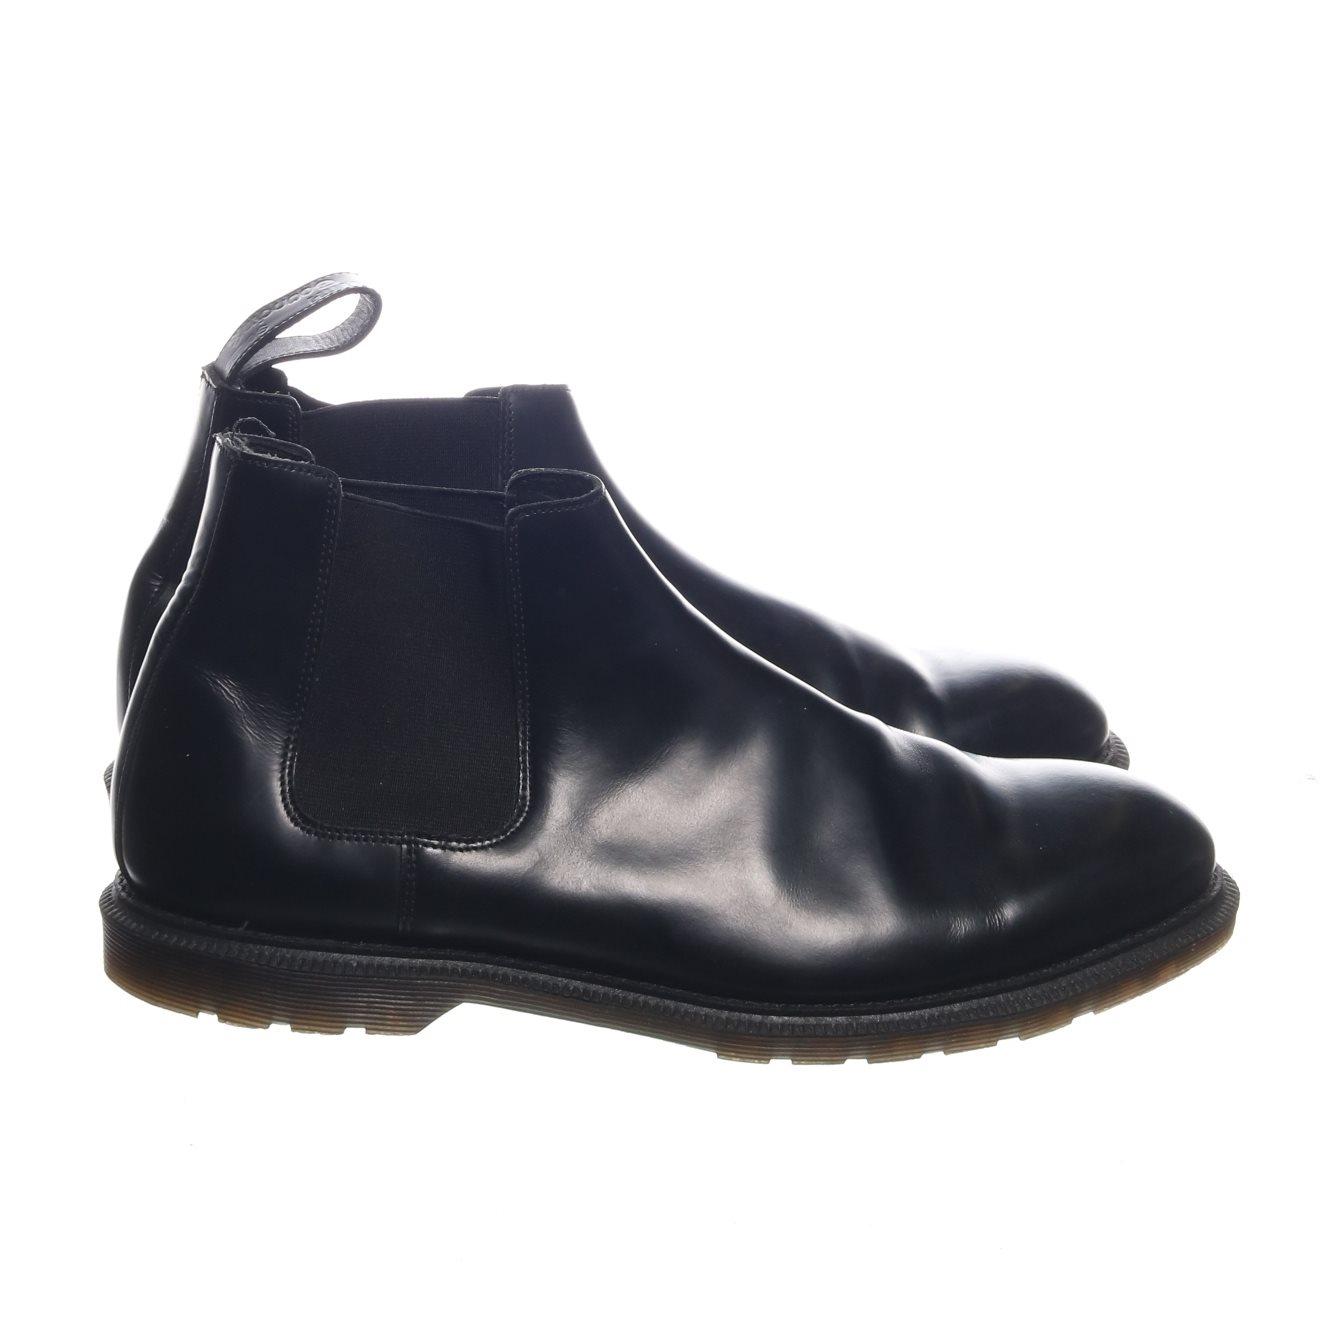 0d2a395da9b Dr. Martens, Boots, Strl: 44, Svart, Skinn (343927398) ᐈ Sellpy på ...